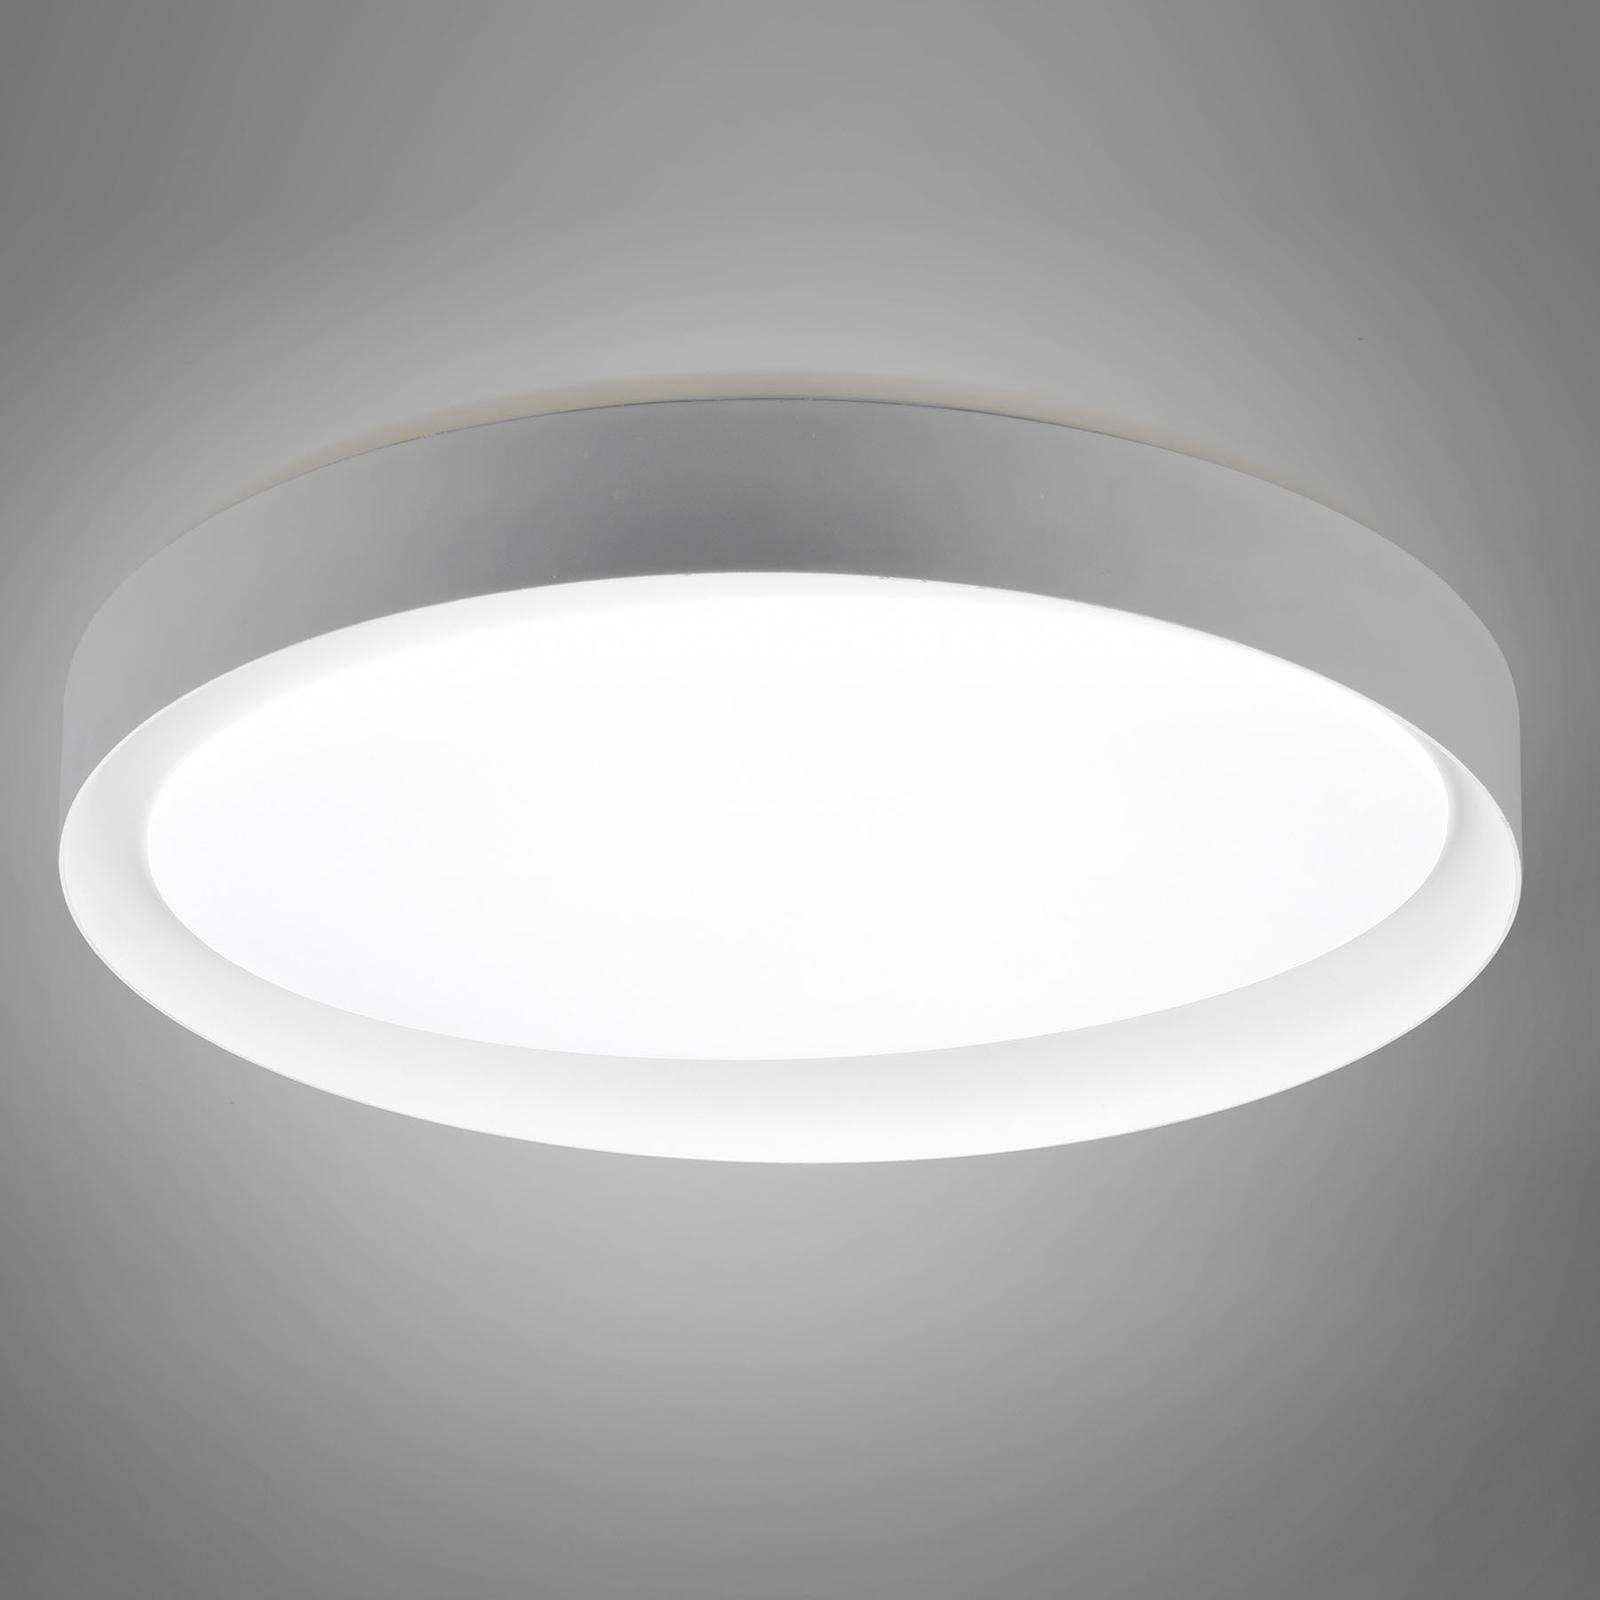 Lampa sufitowa LED Zeta tunable white, szara/biała